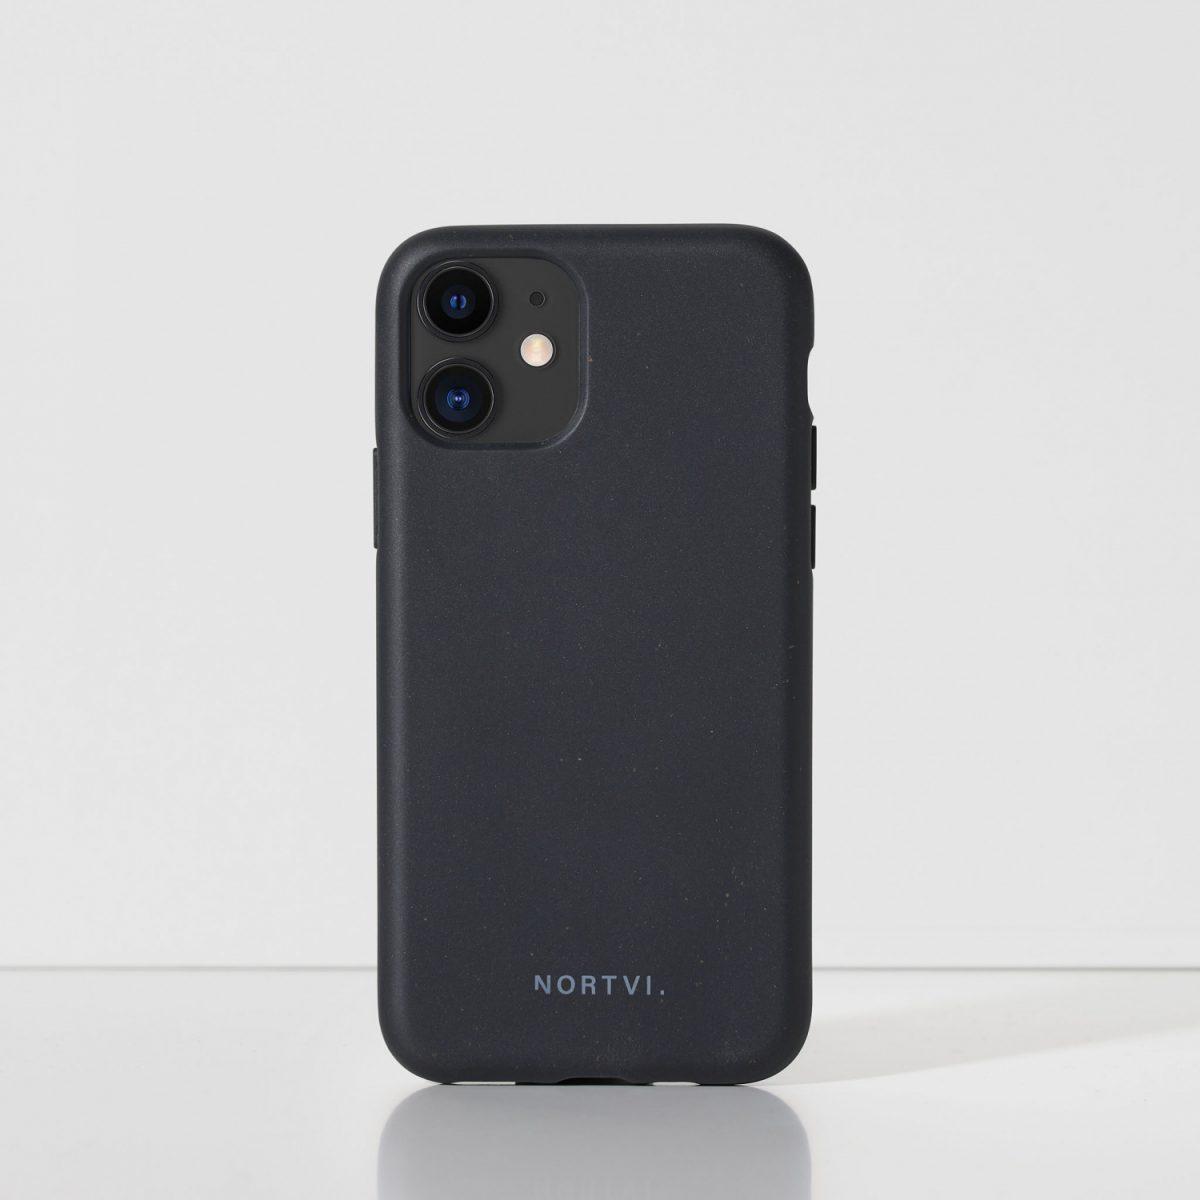 NORTVI black phone case for iPhone 11 case